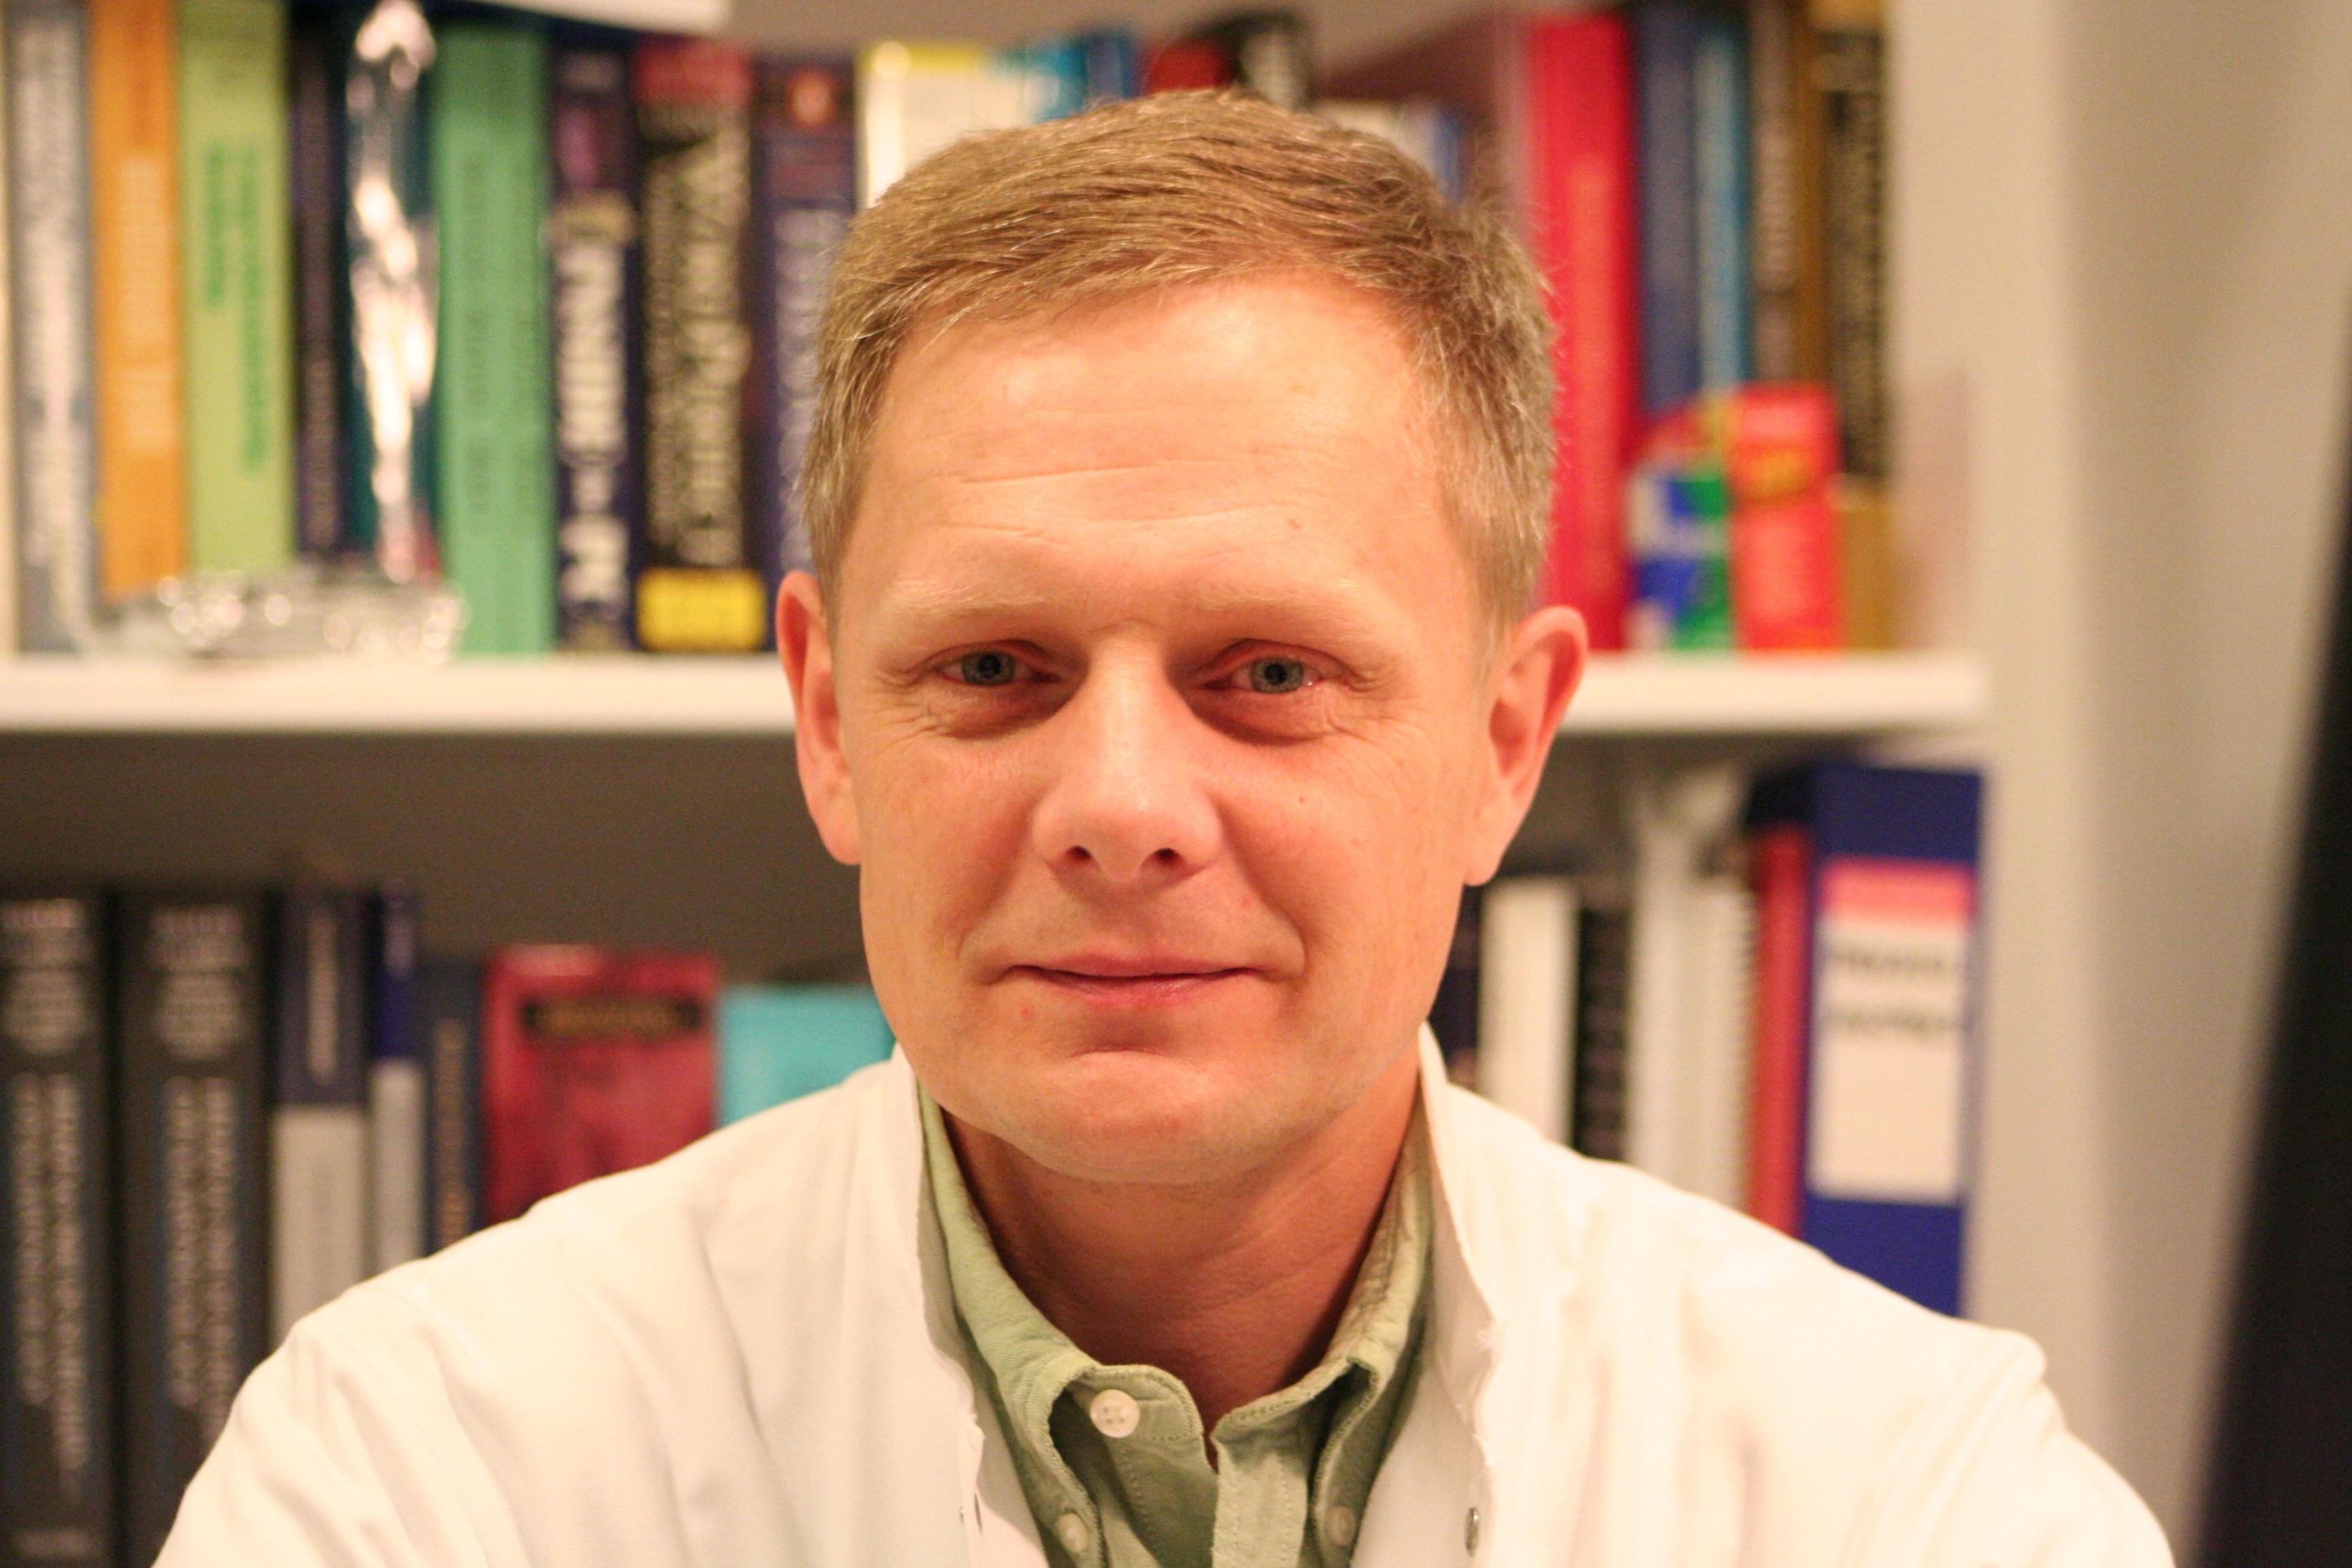 Michael Gaihede